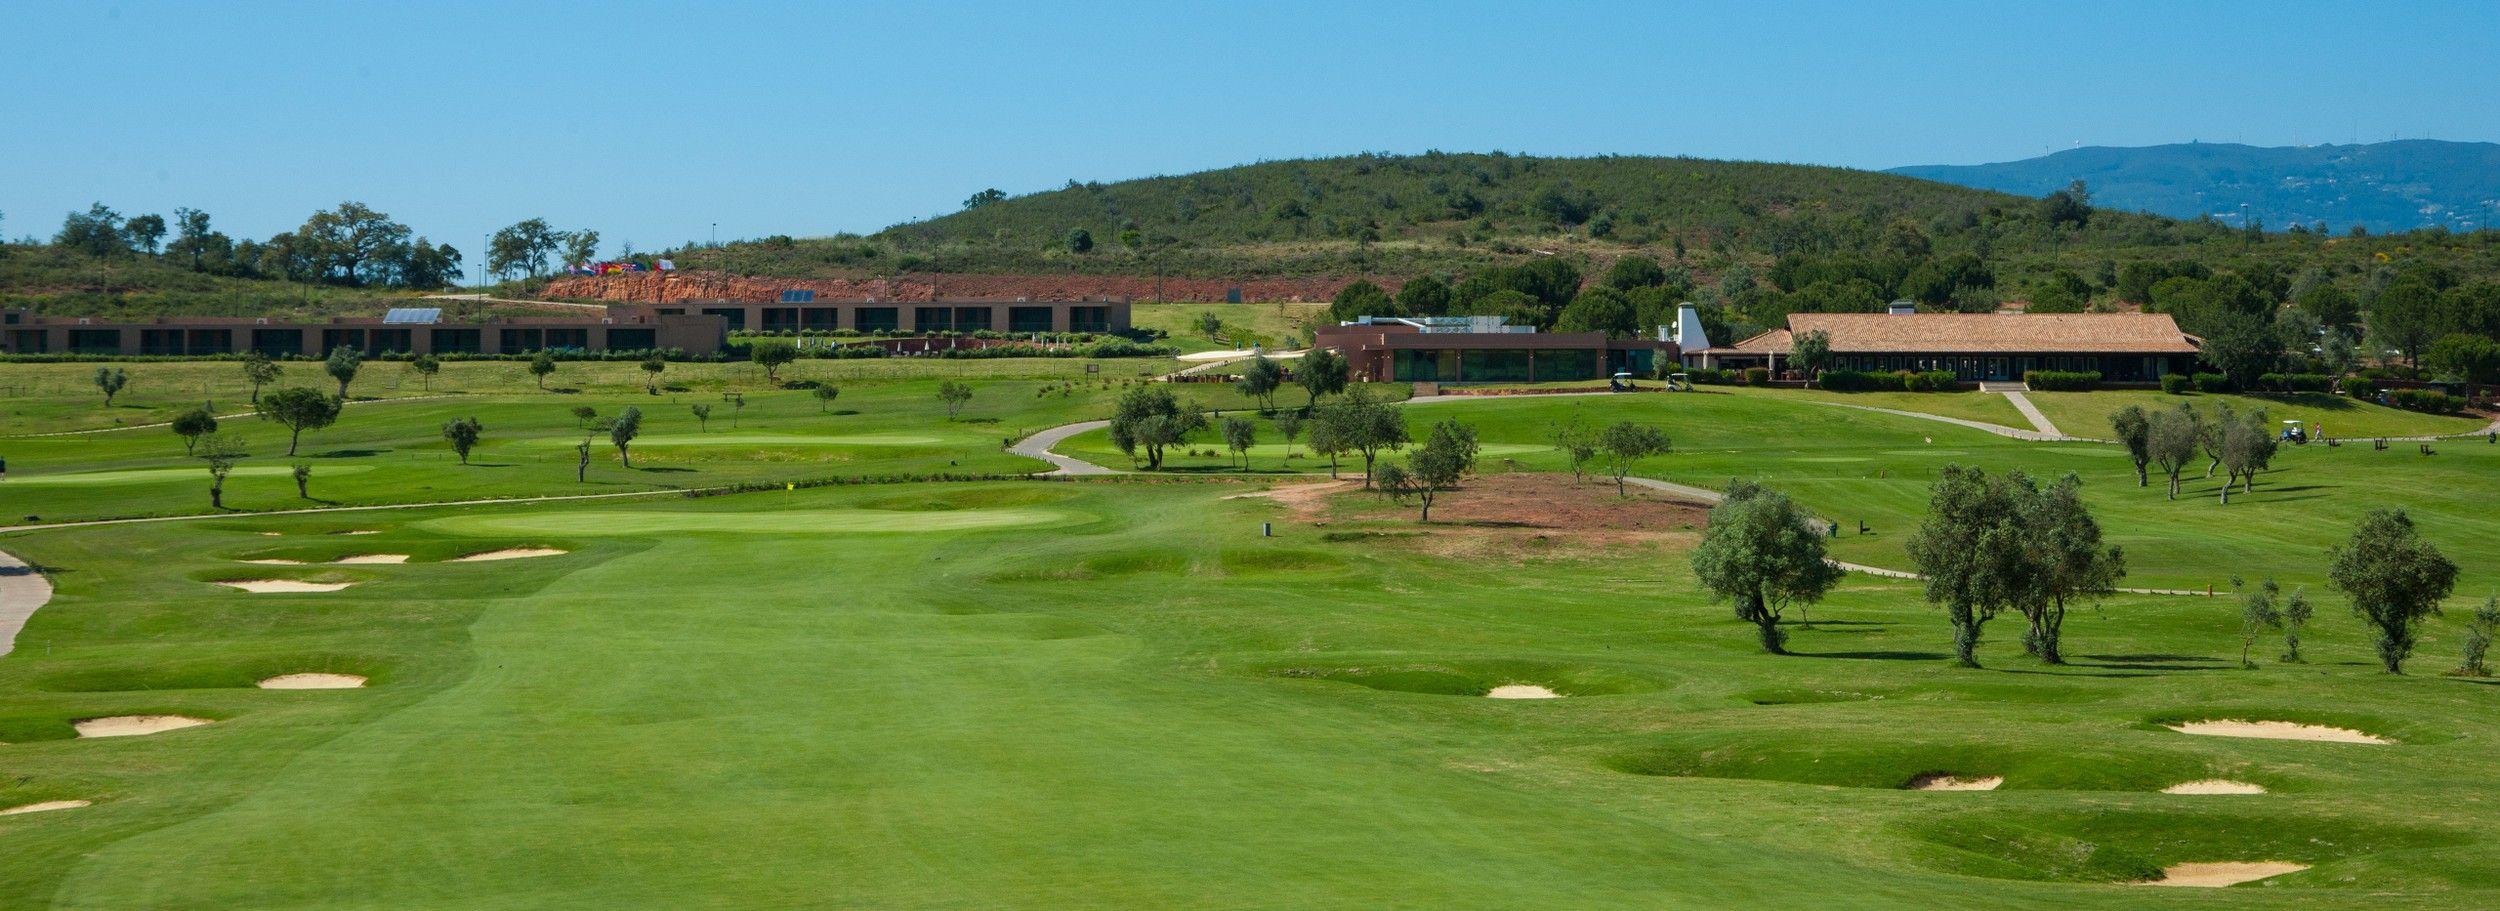 15++ Golf tours brisbane viral